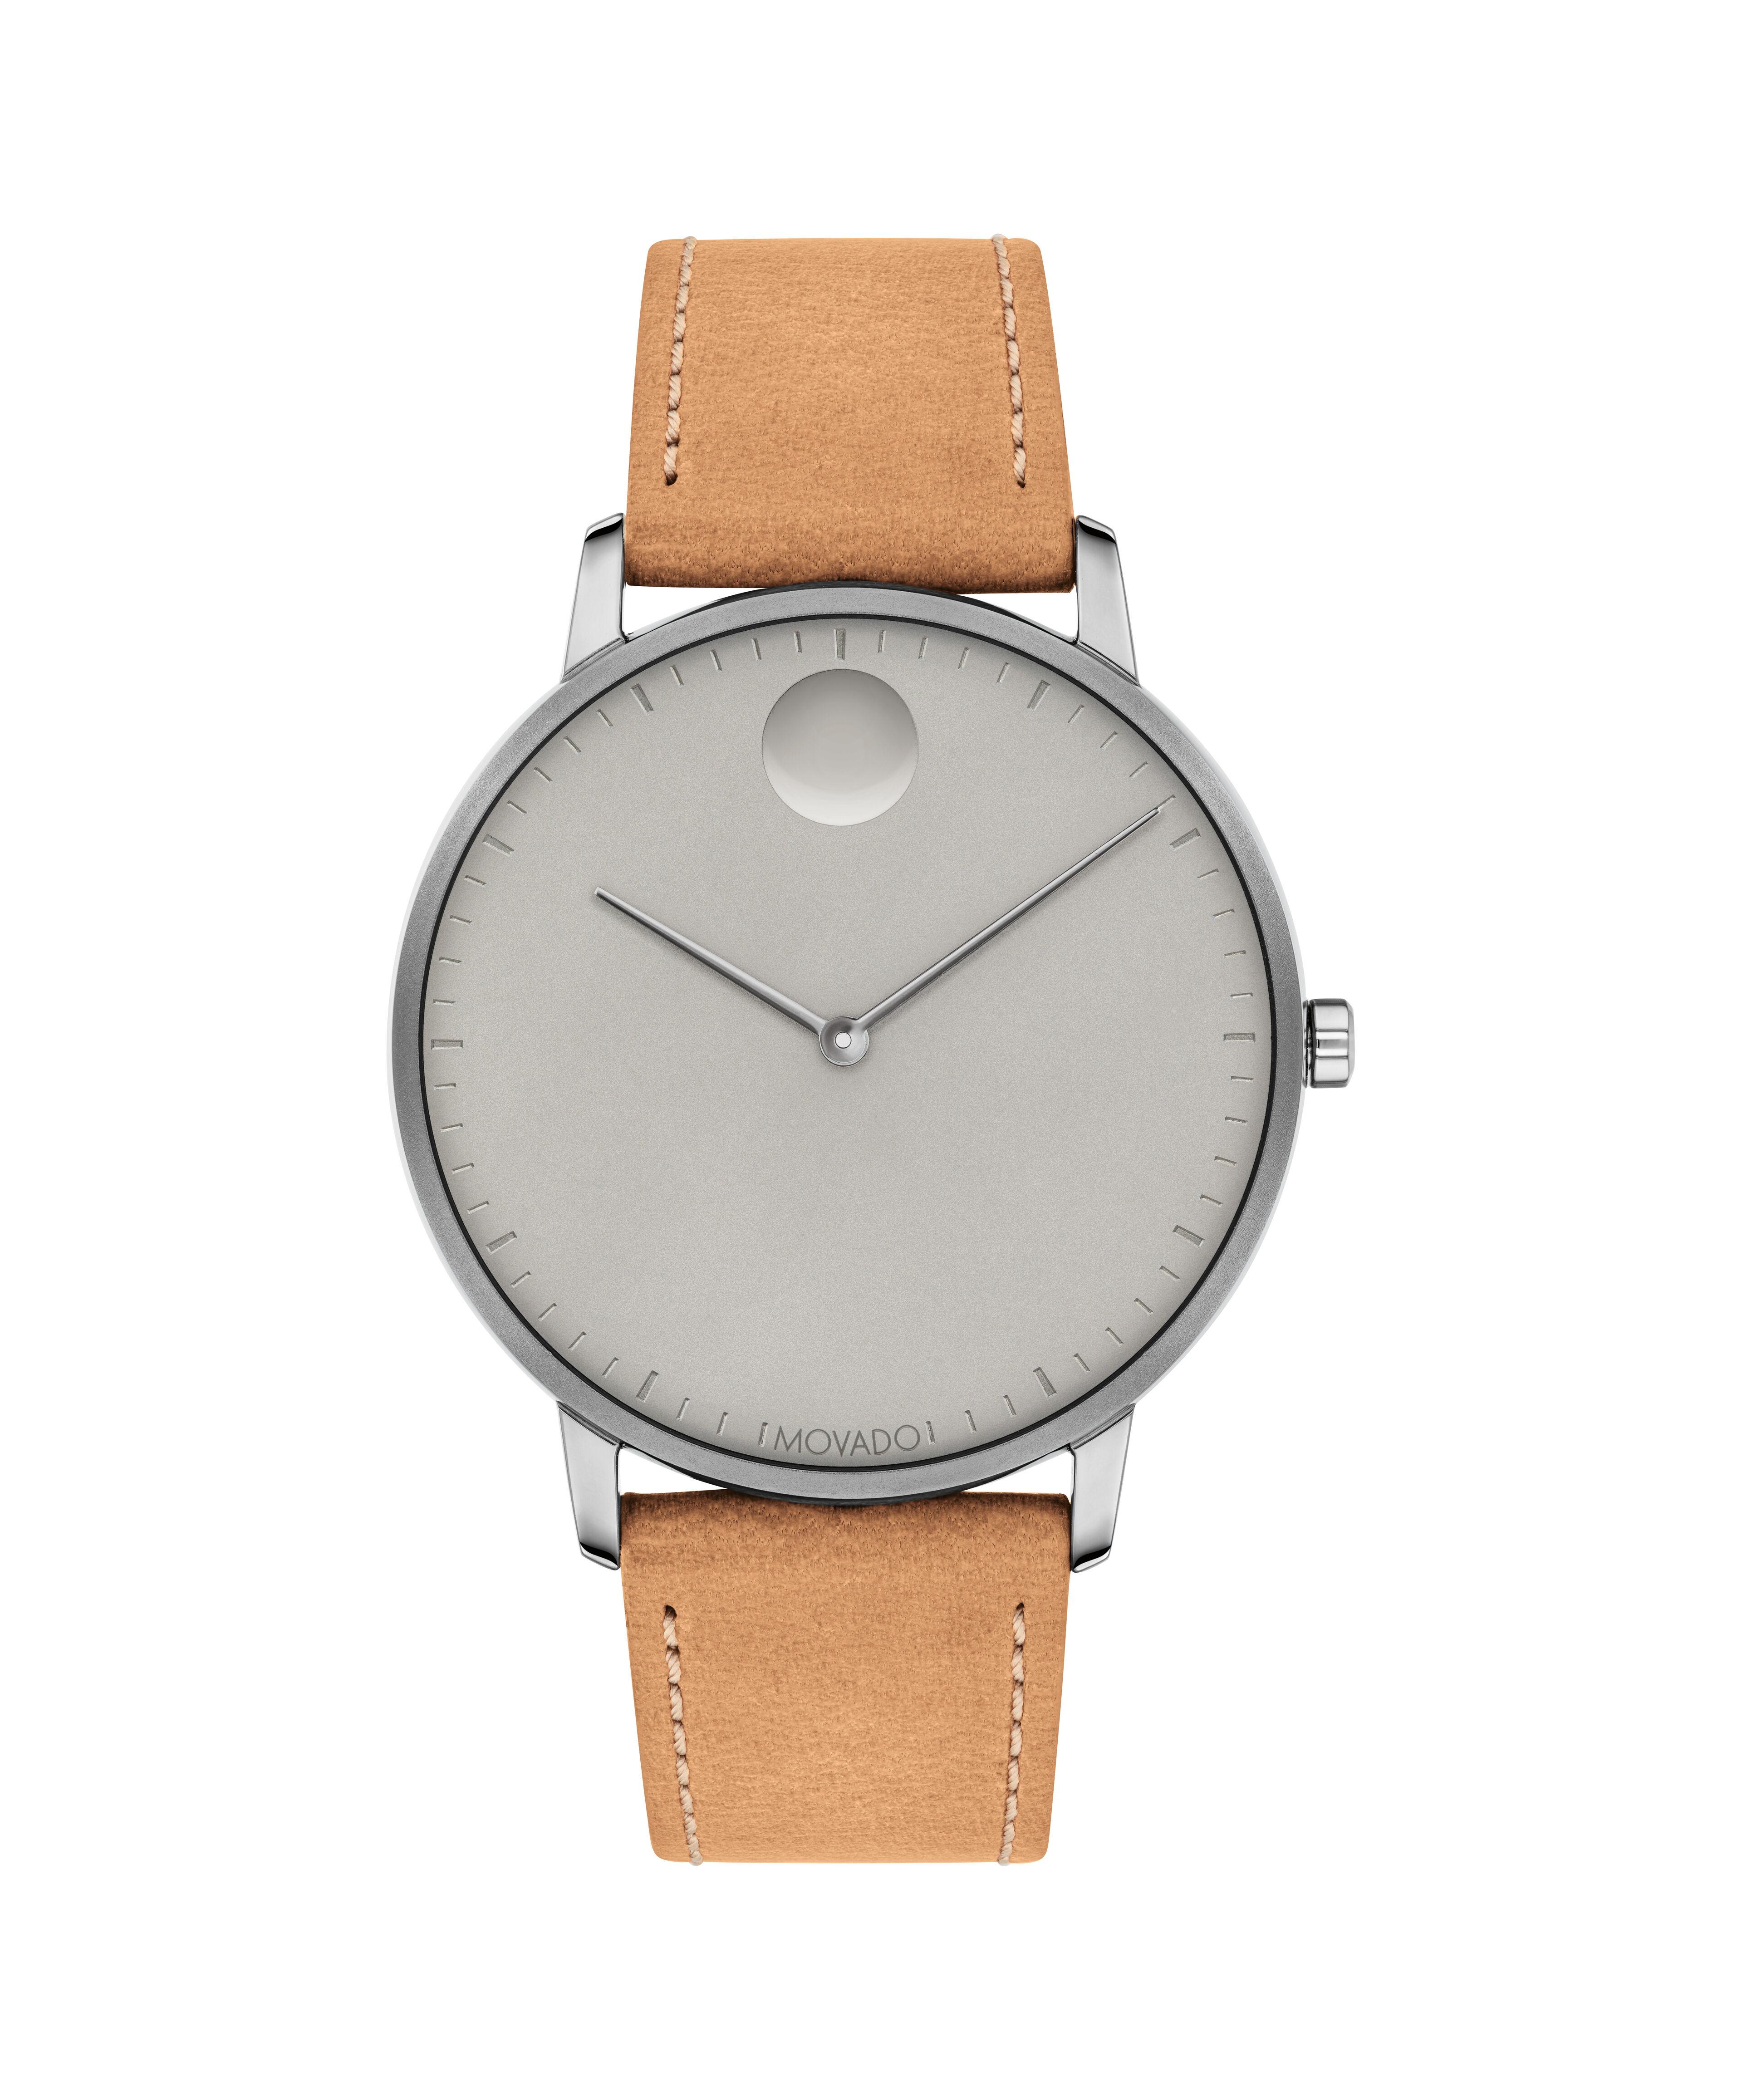 Michael Kors Replica Watches Sale